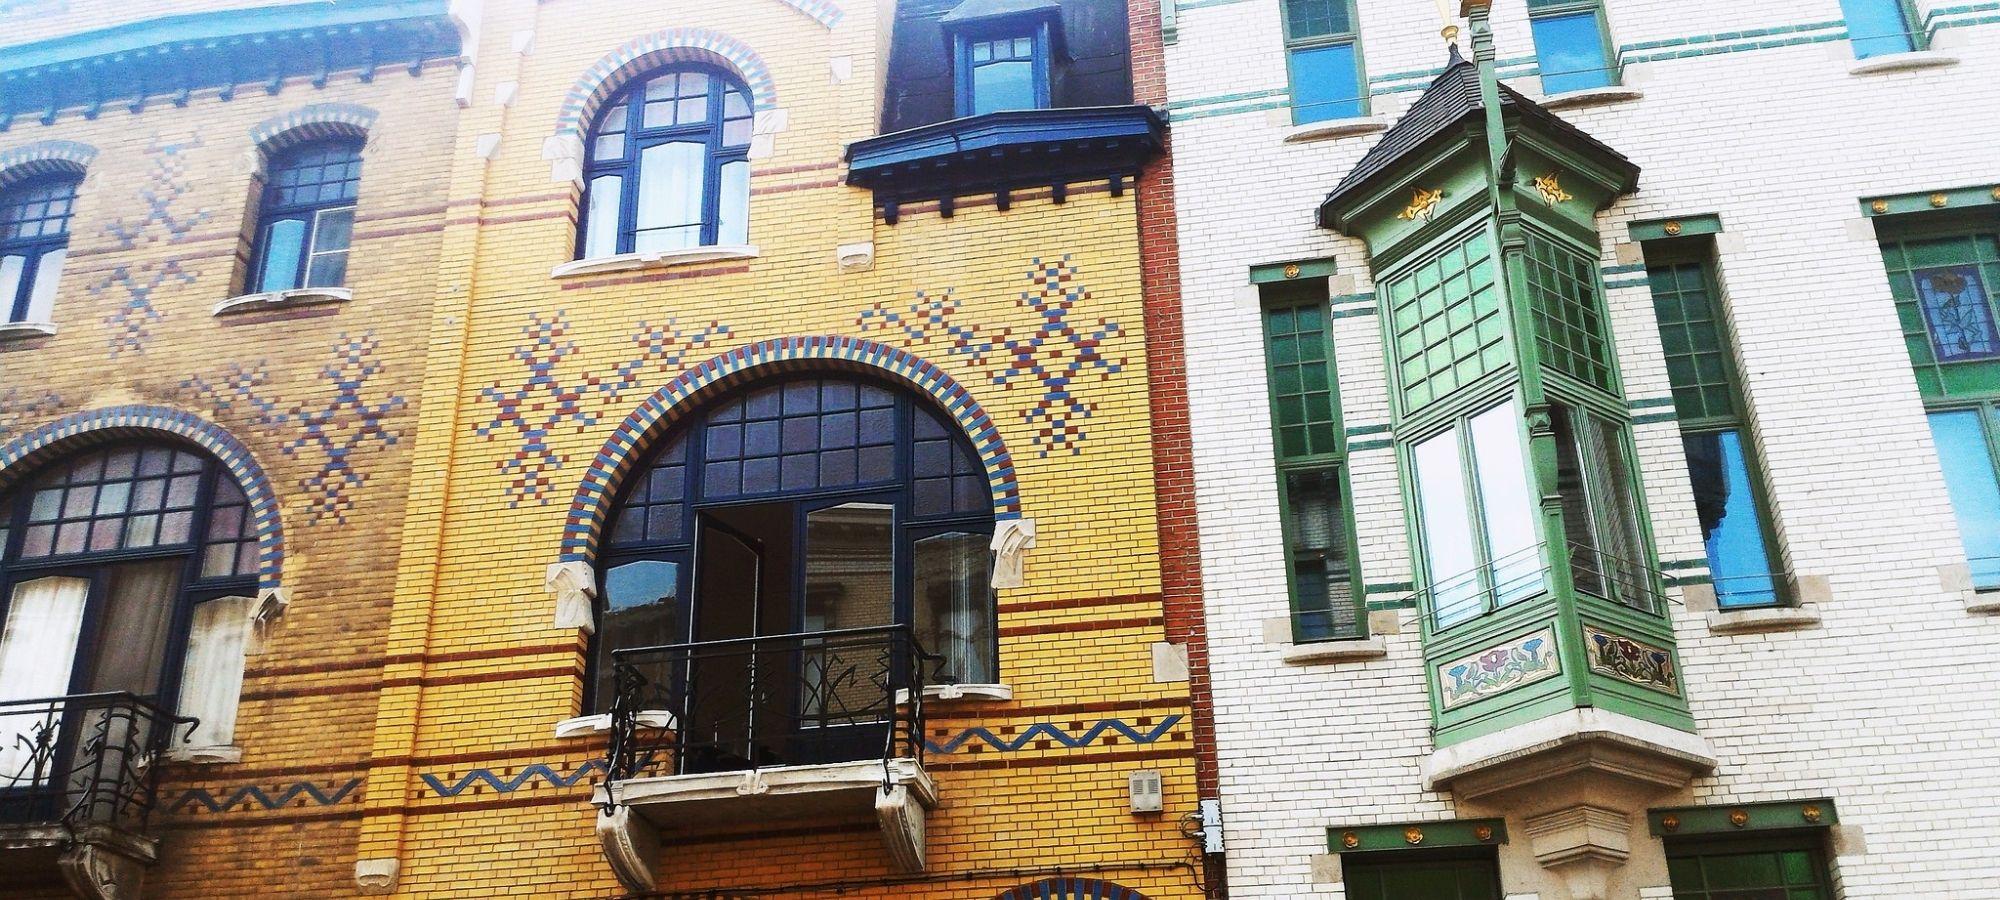 The art nouveau houses in the side streets of Cogels Oyslei in Zurenborg, Antwerpen